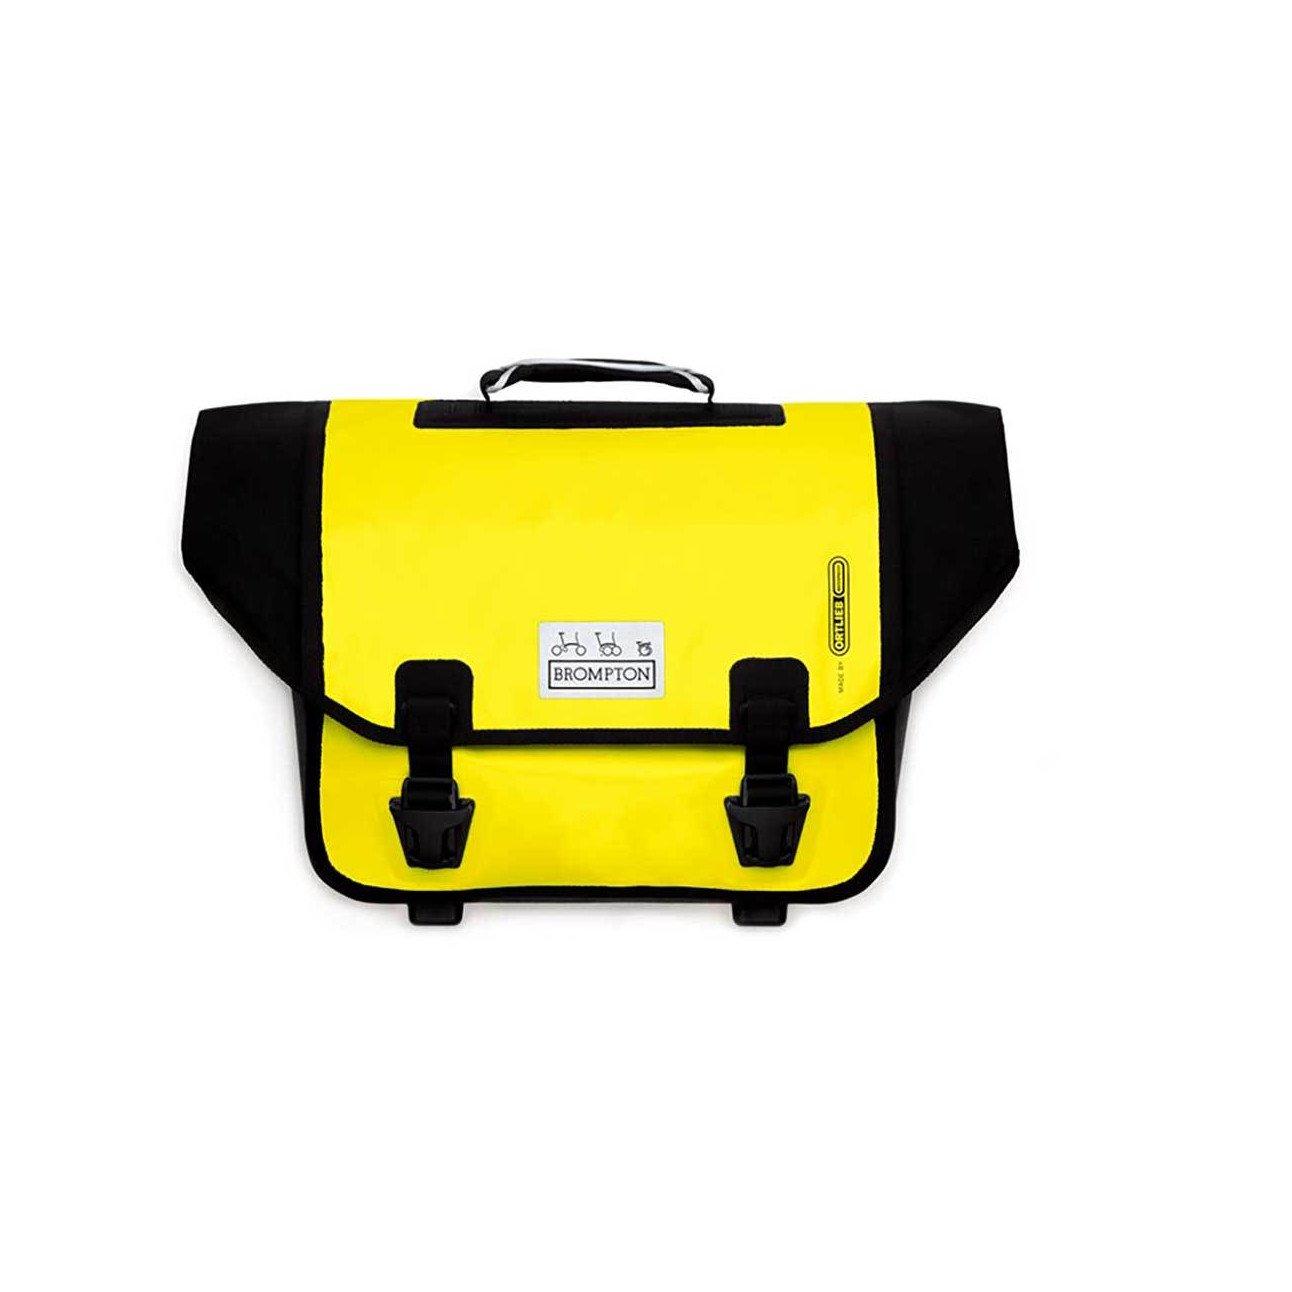 NEW Brompton O Bag Ortlieb Messenger Bag Berry YELLOW